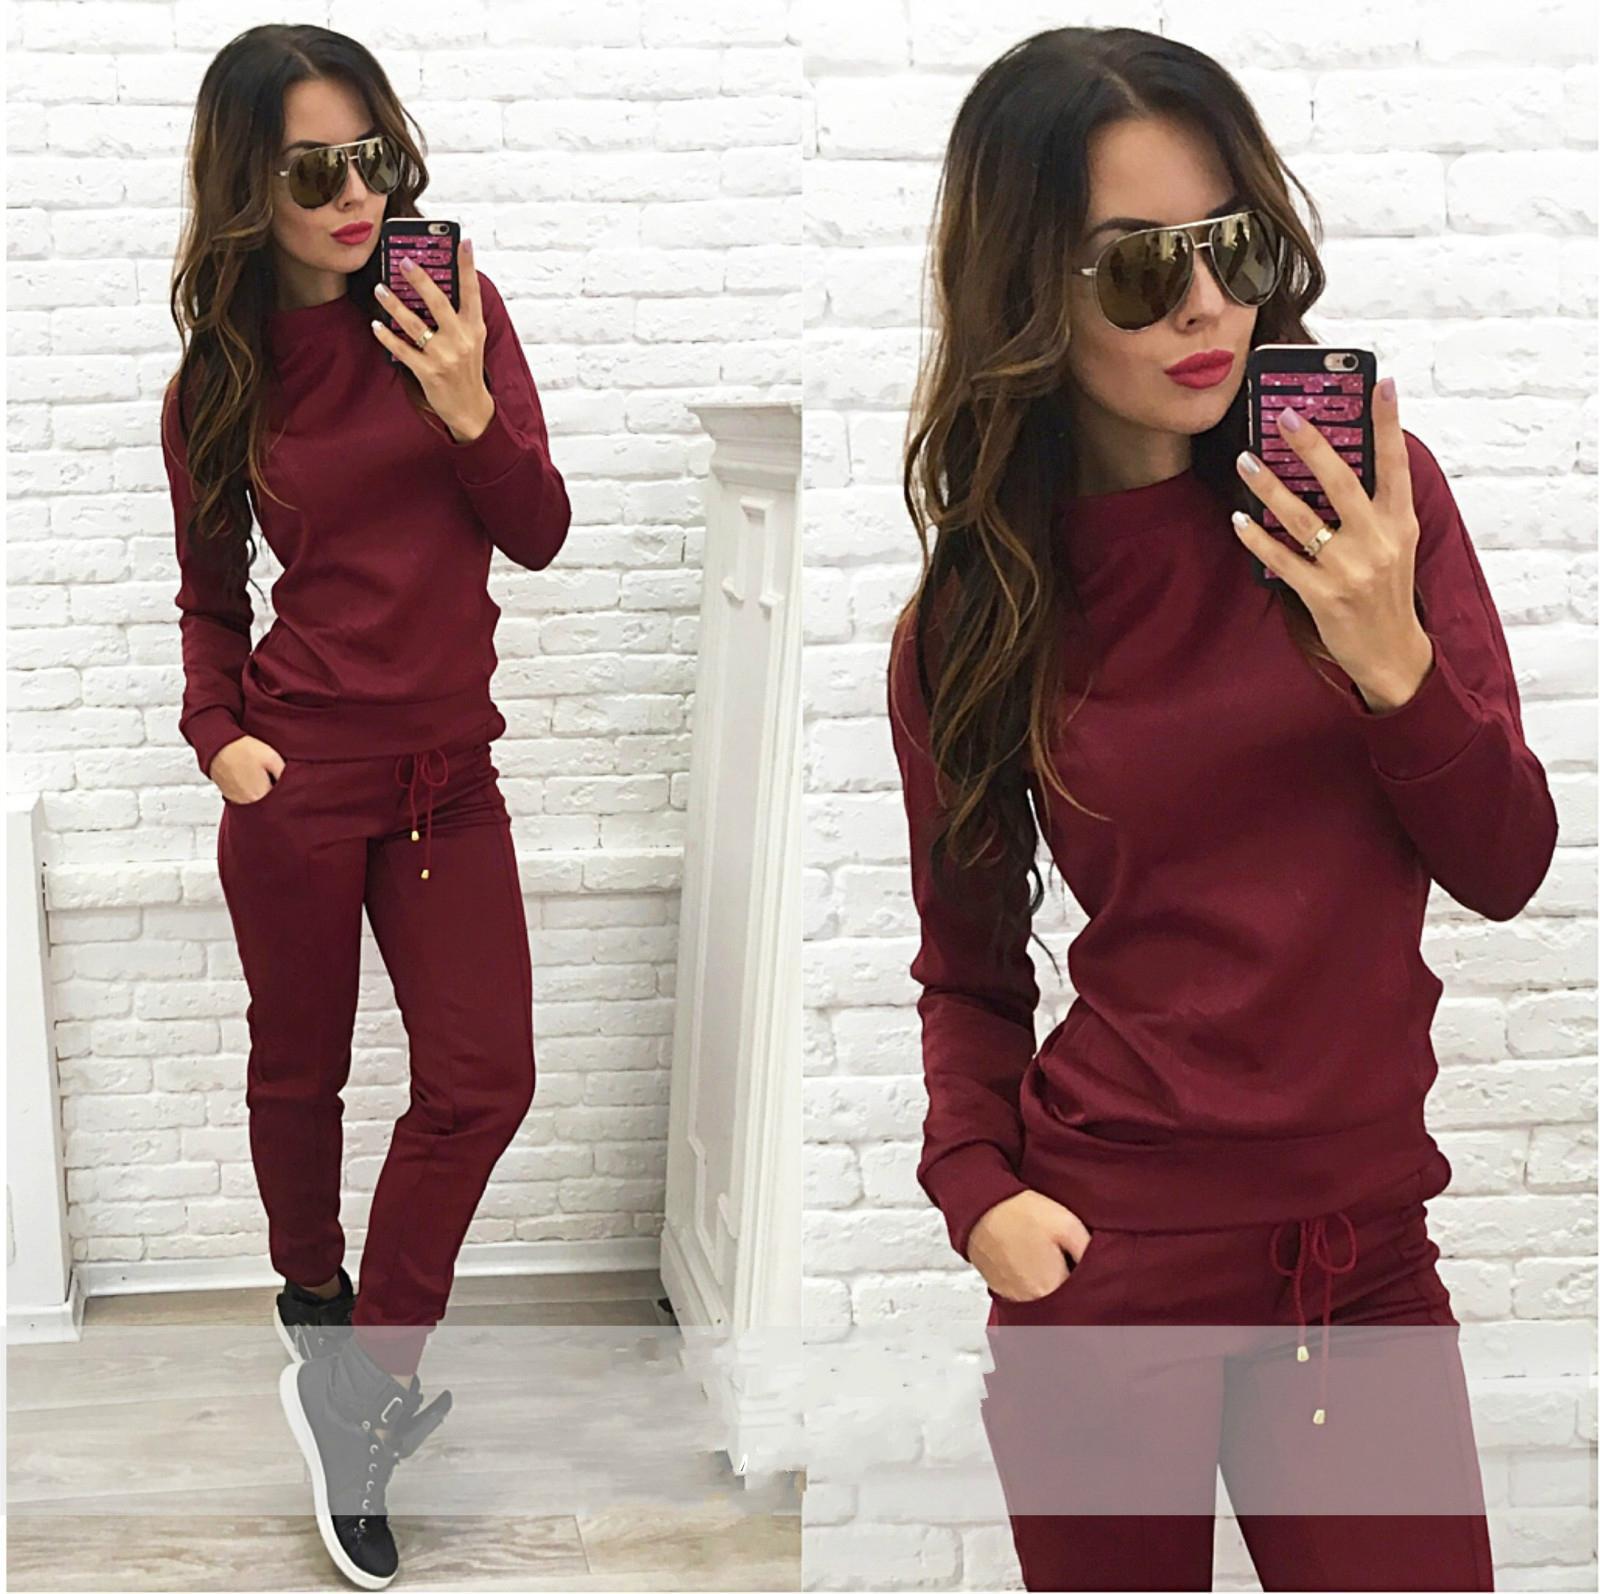 Solid Brown 2020 New Design Fashion Hot Sale Suit Set Women Tracksuit Two-piece Style Outfit Sweatshirt Sport Wear